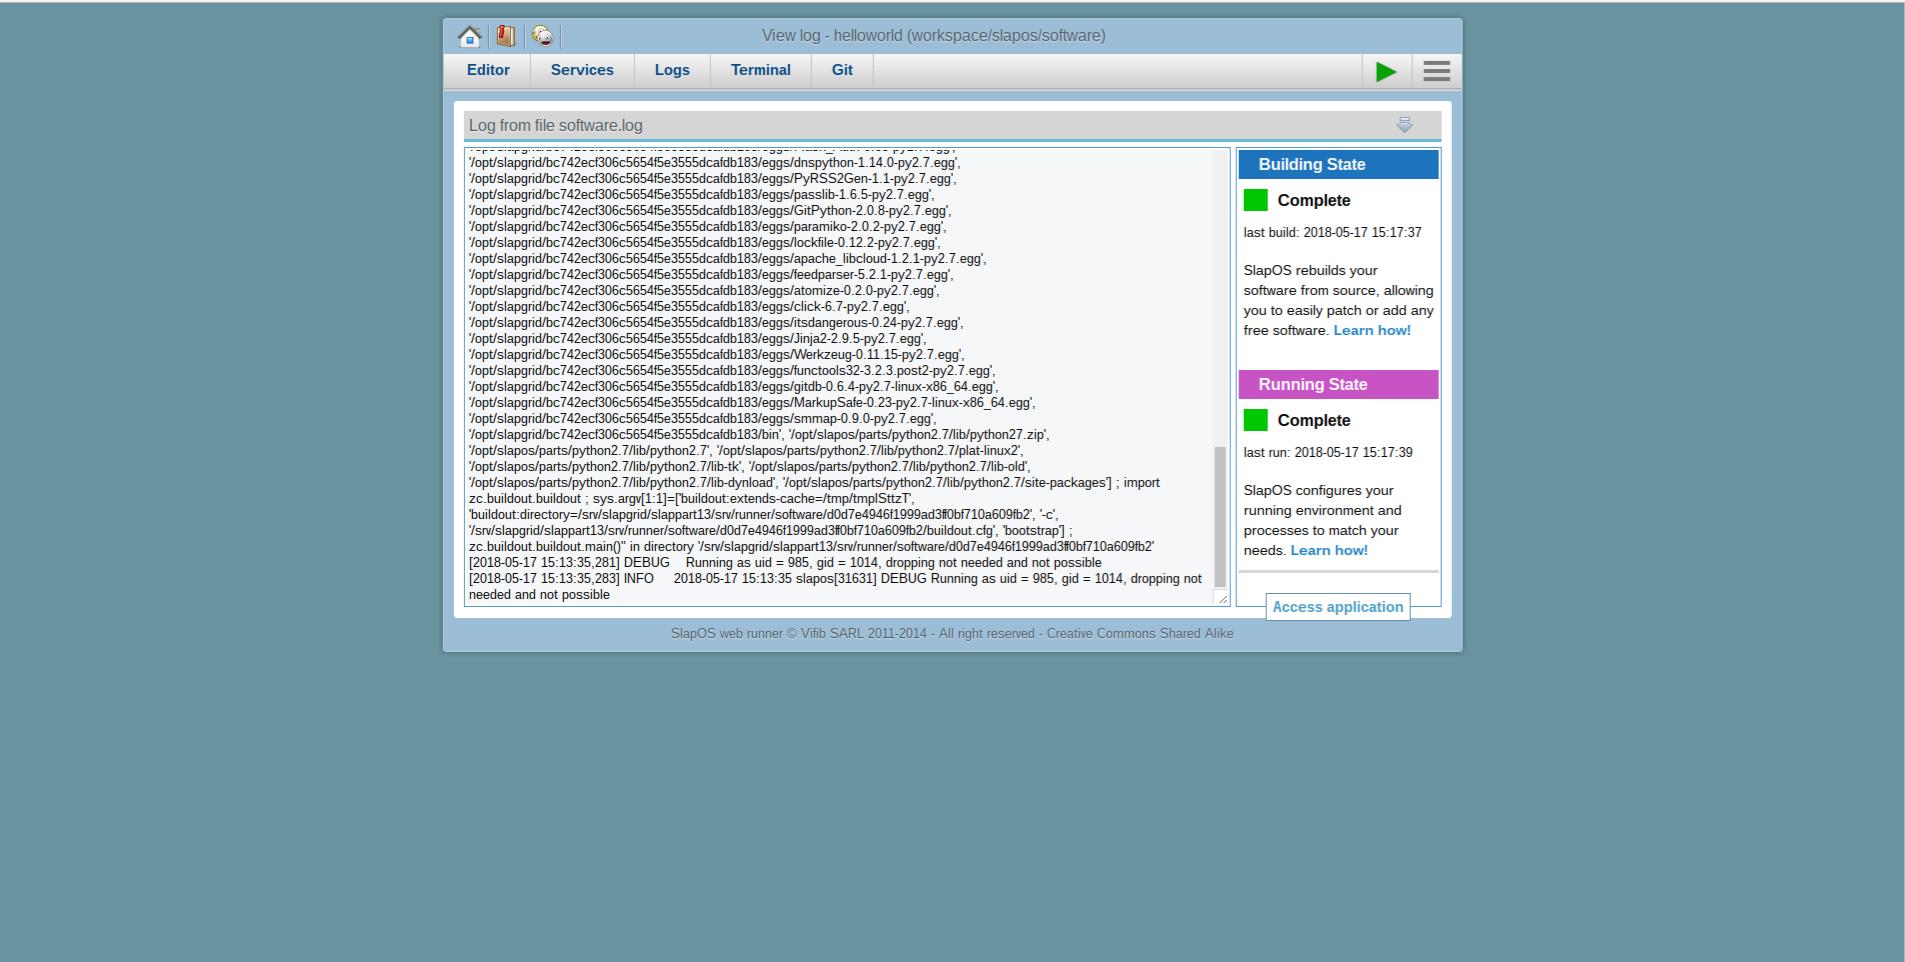 Extending Software Release - Webrunner Interface - Rebuild Software with Logrotate